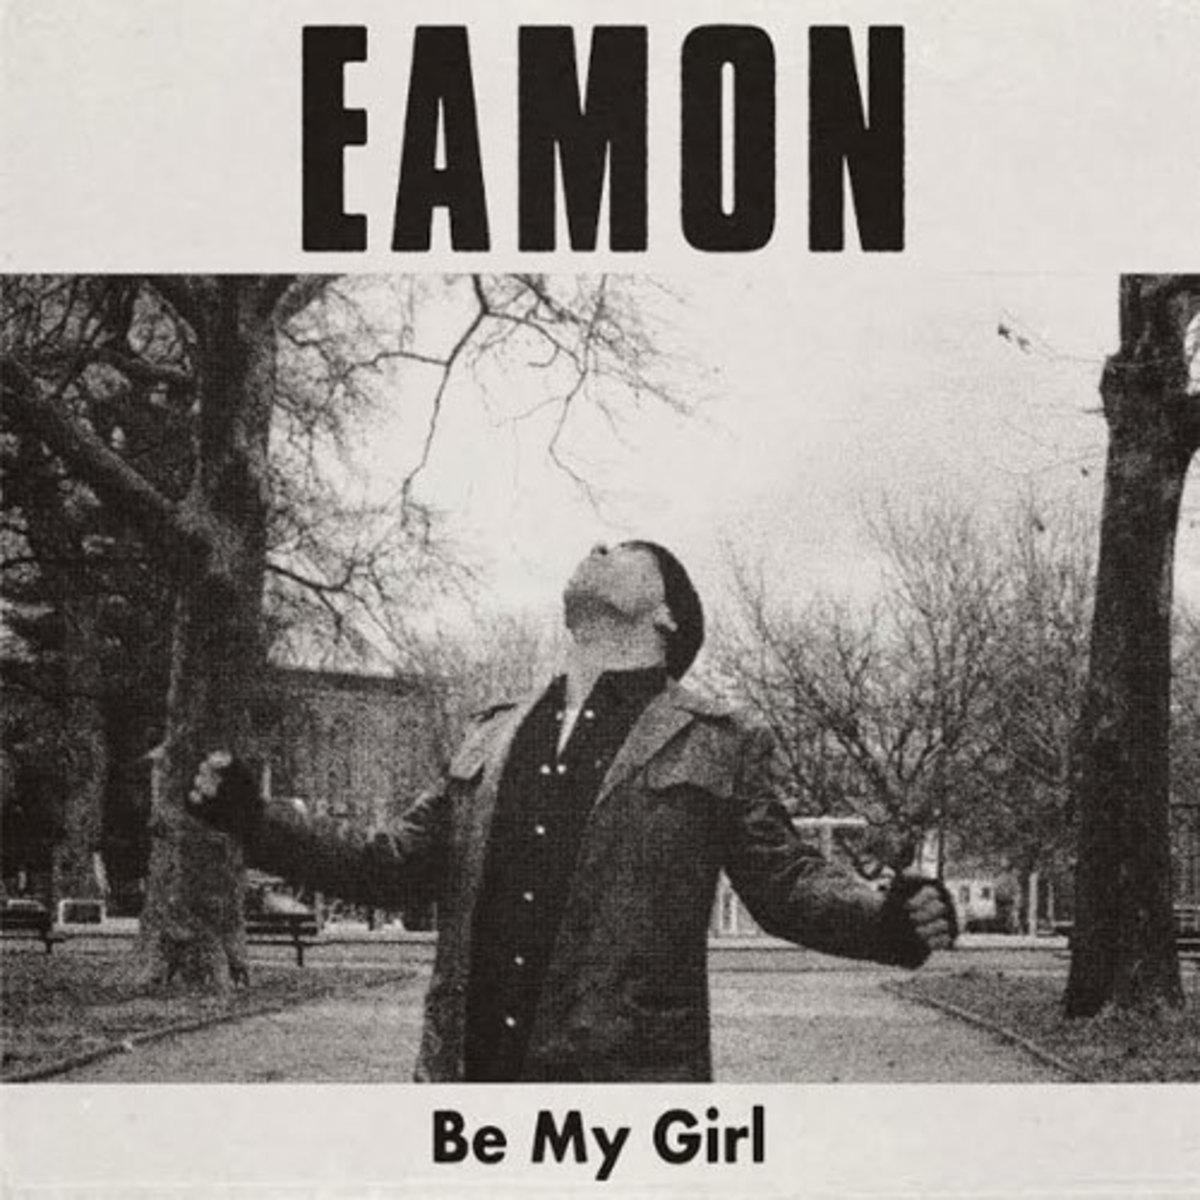 eamon-be-my-girl.jpg